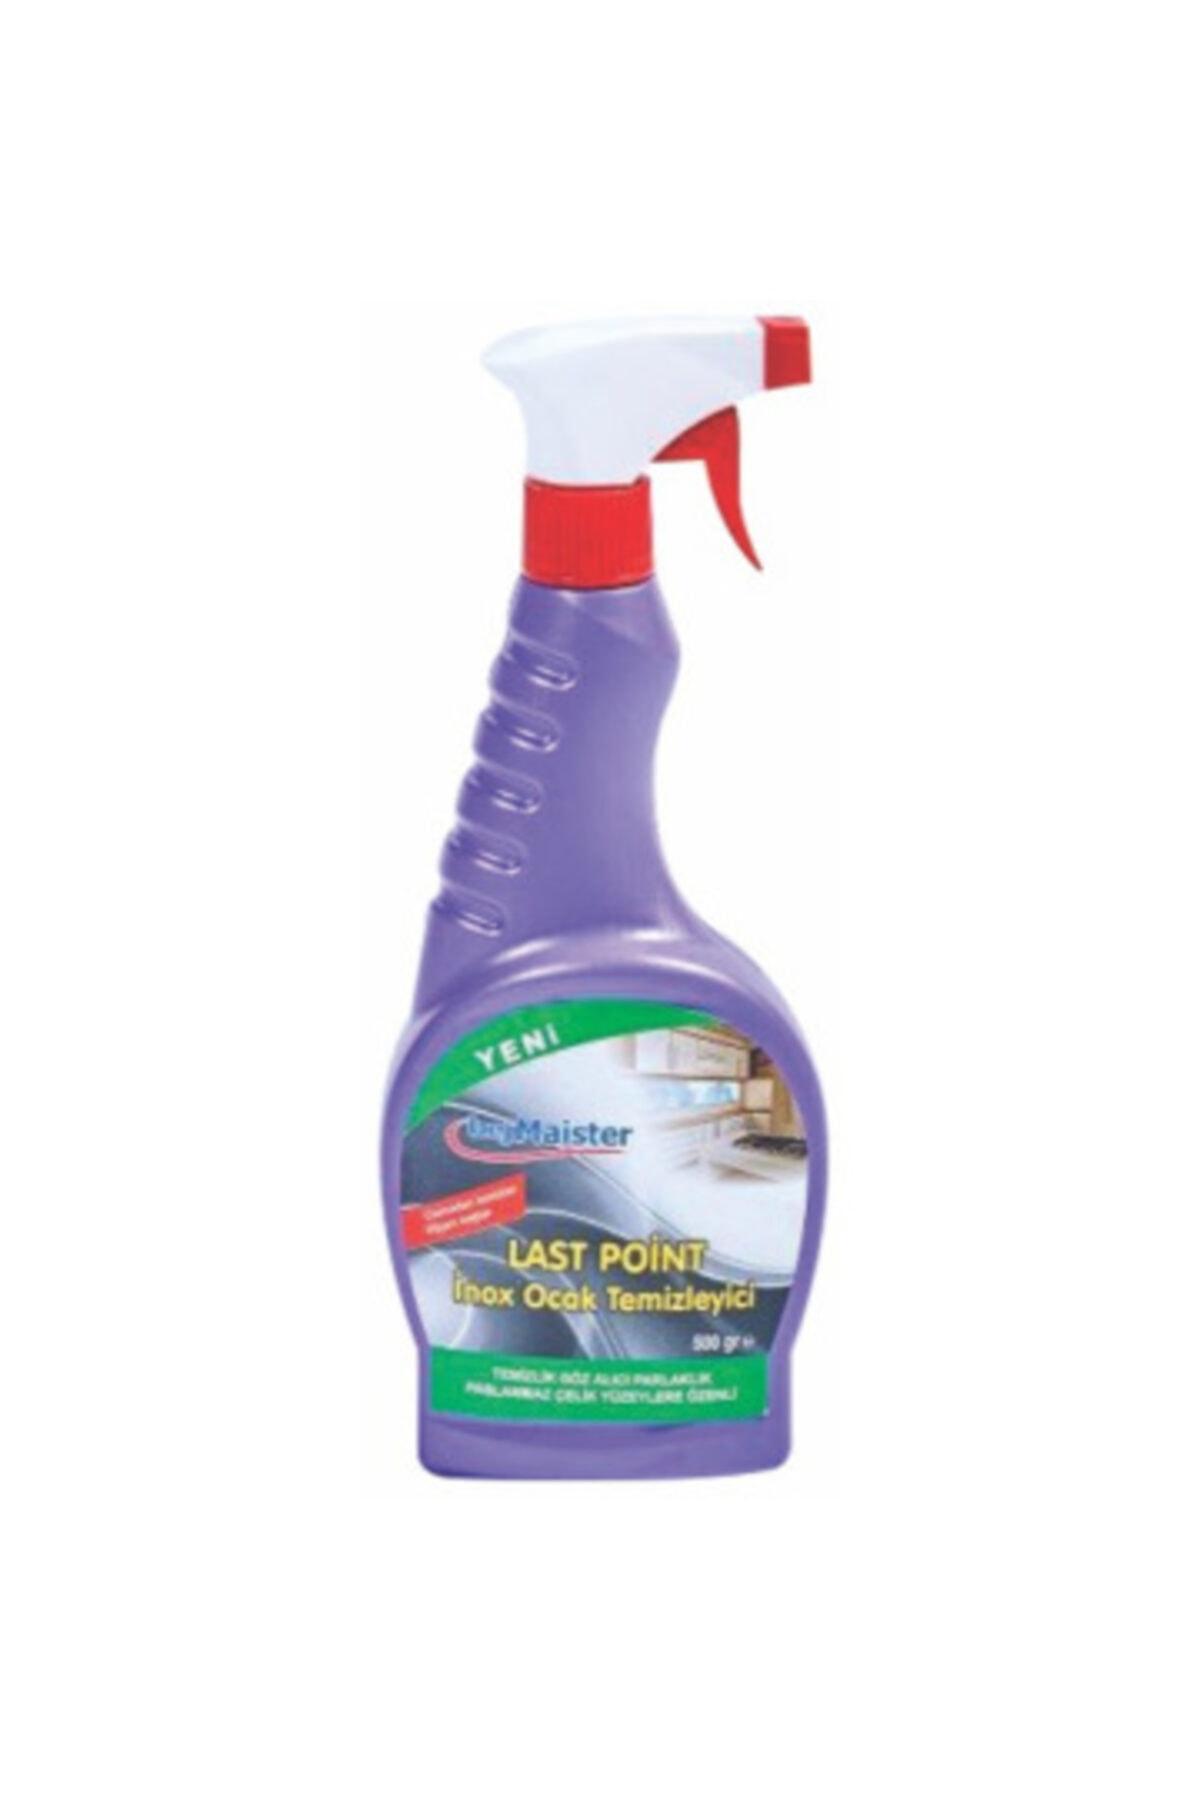 MAISTER HOME Bej Maıster Last Point - Inox Ocak Temizleyici 500 ml 1